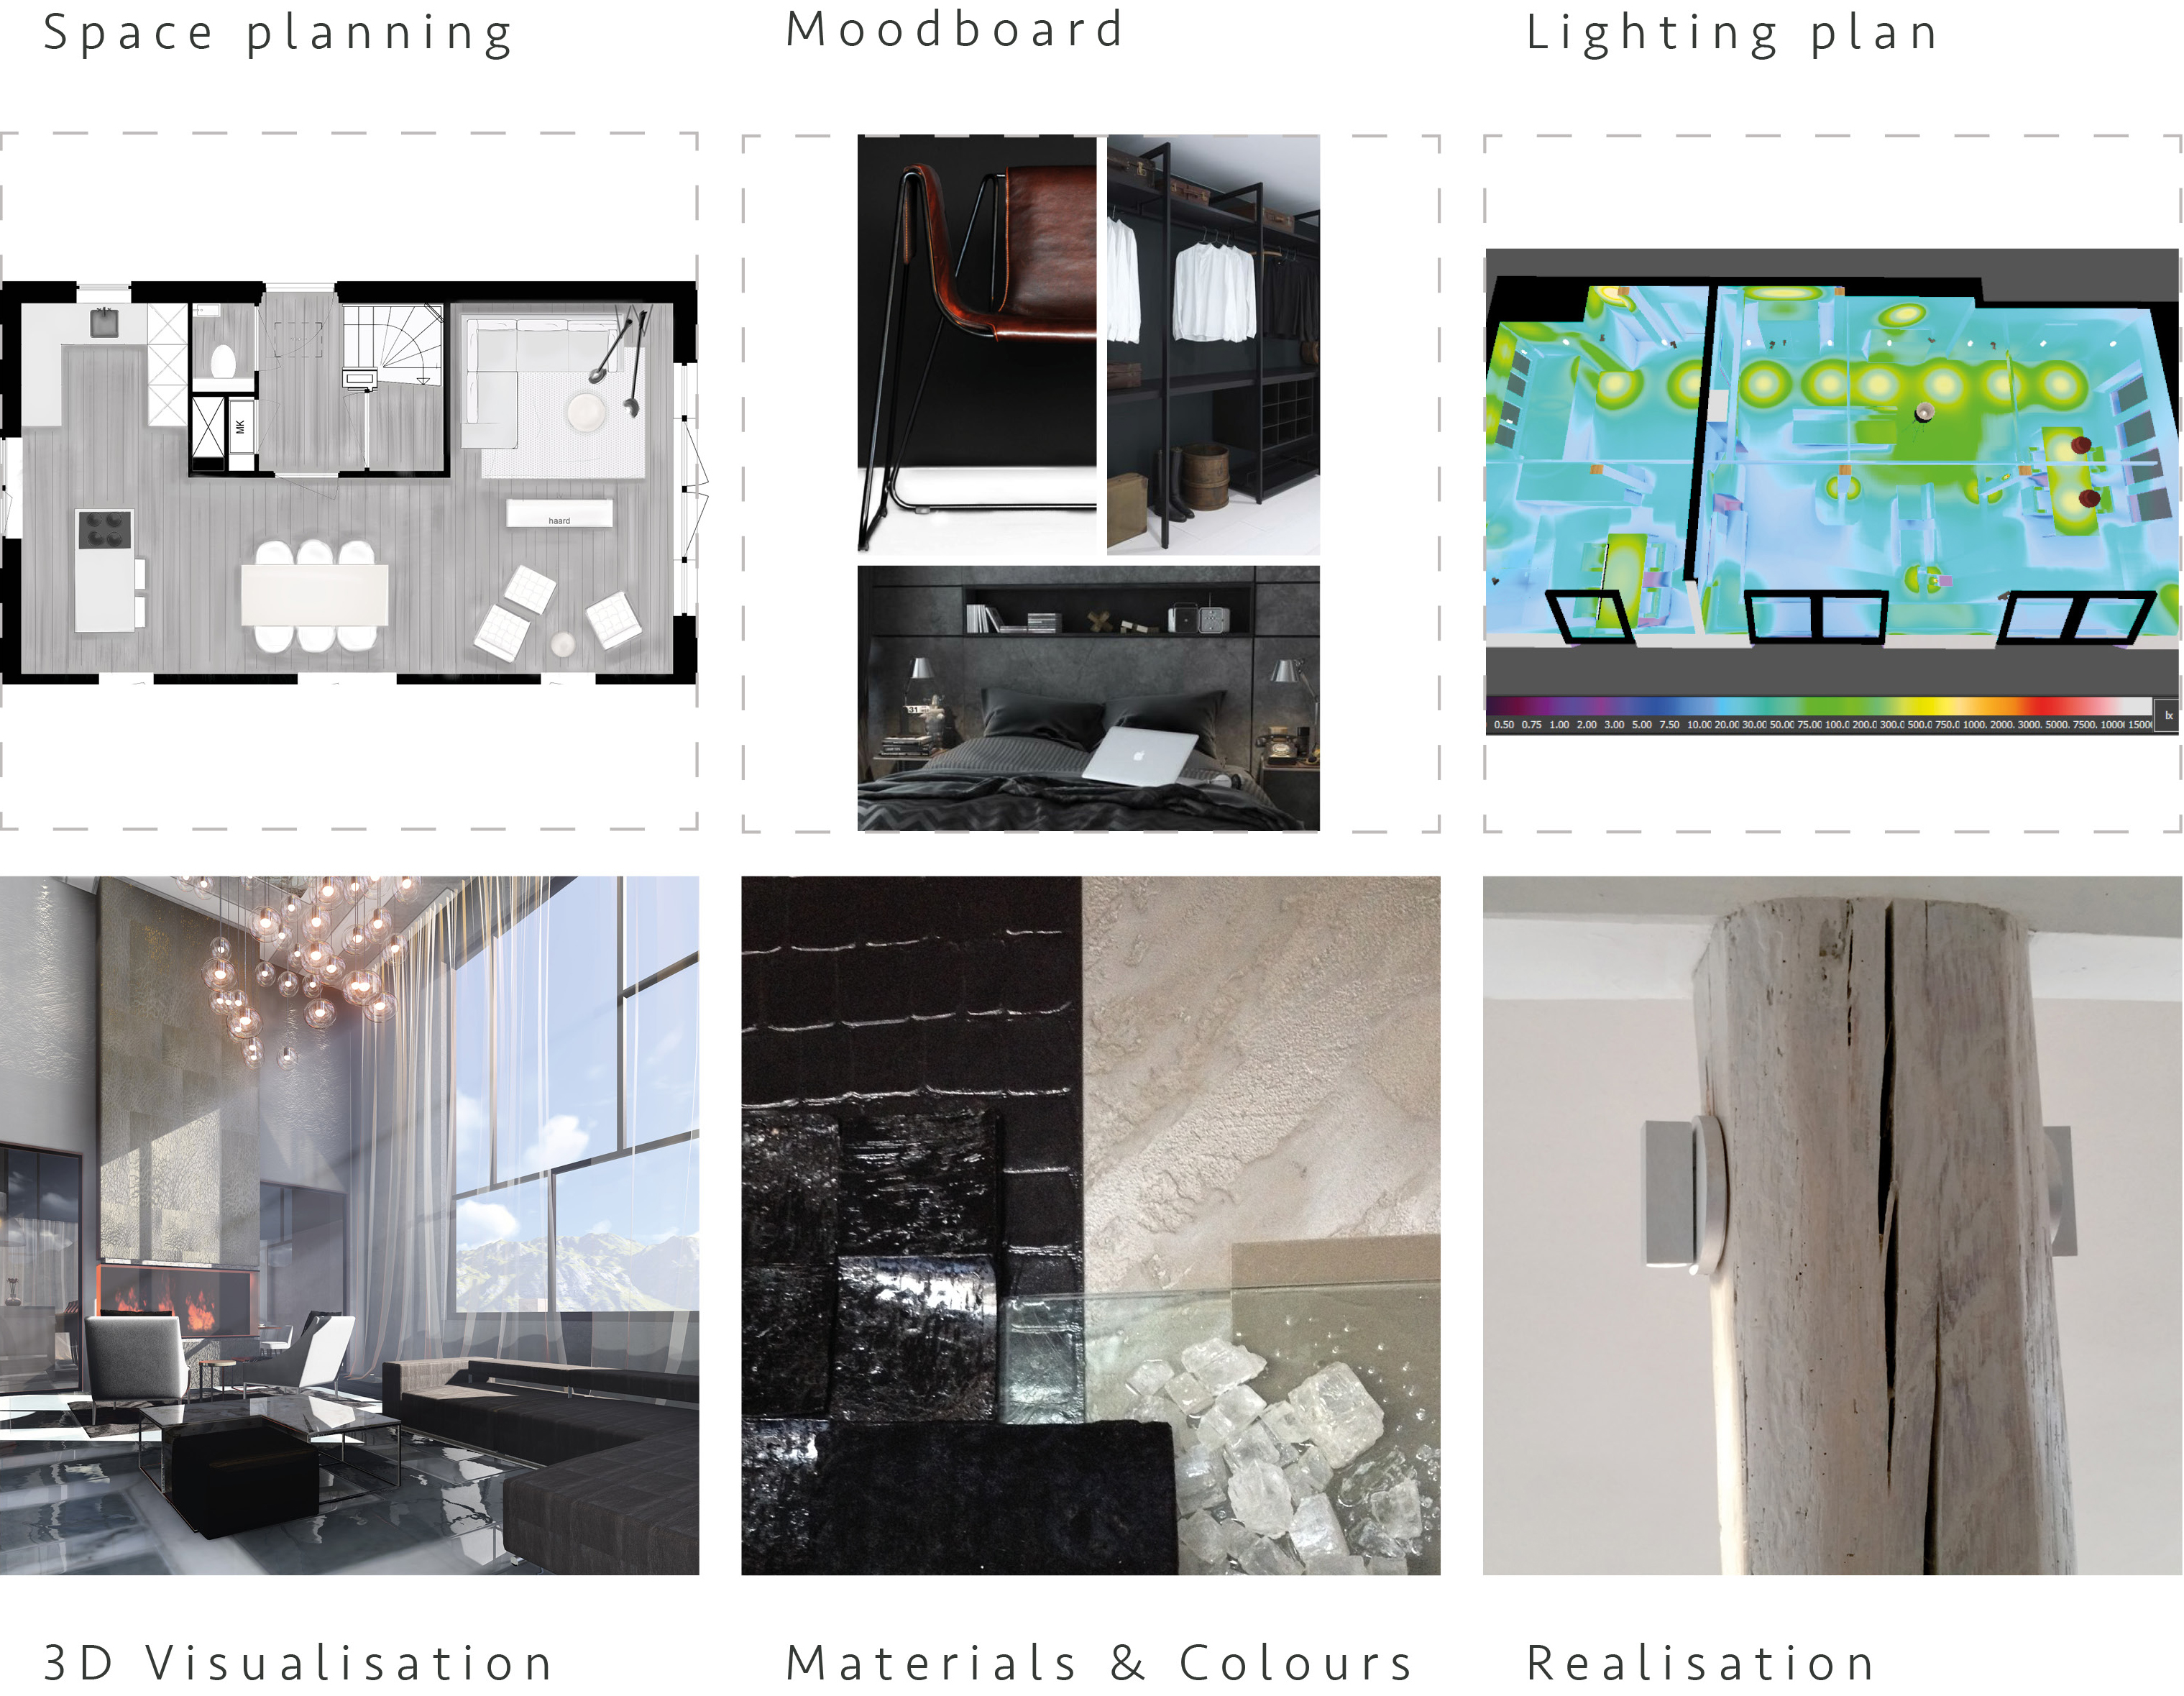 Design By Meyn Interior Lighting Architectural Design Mijntje